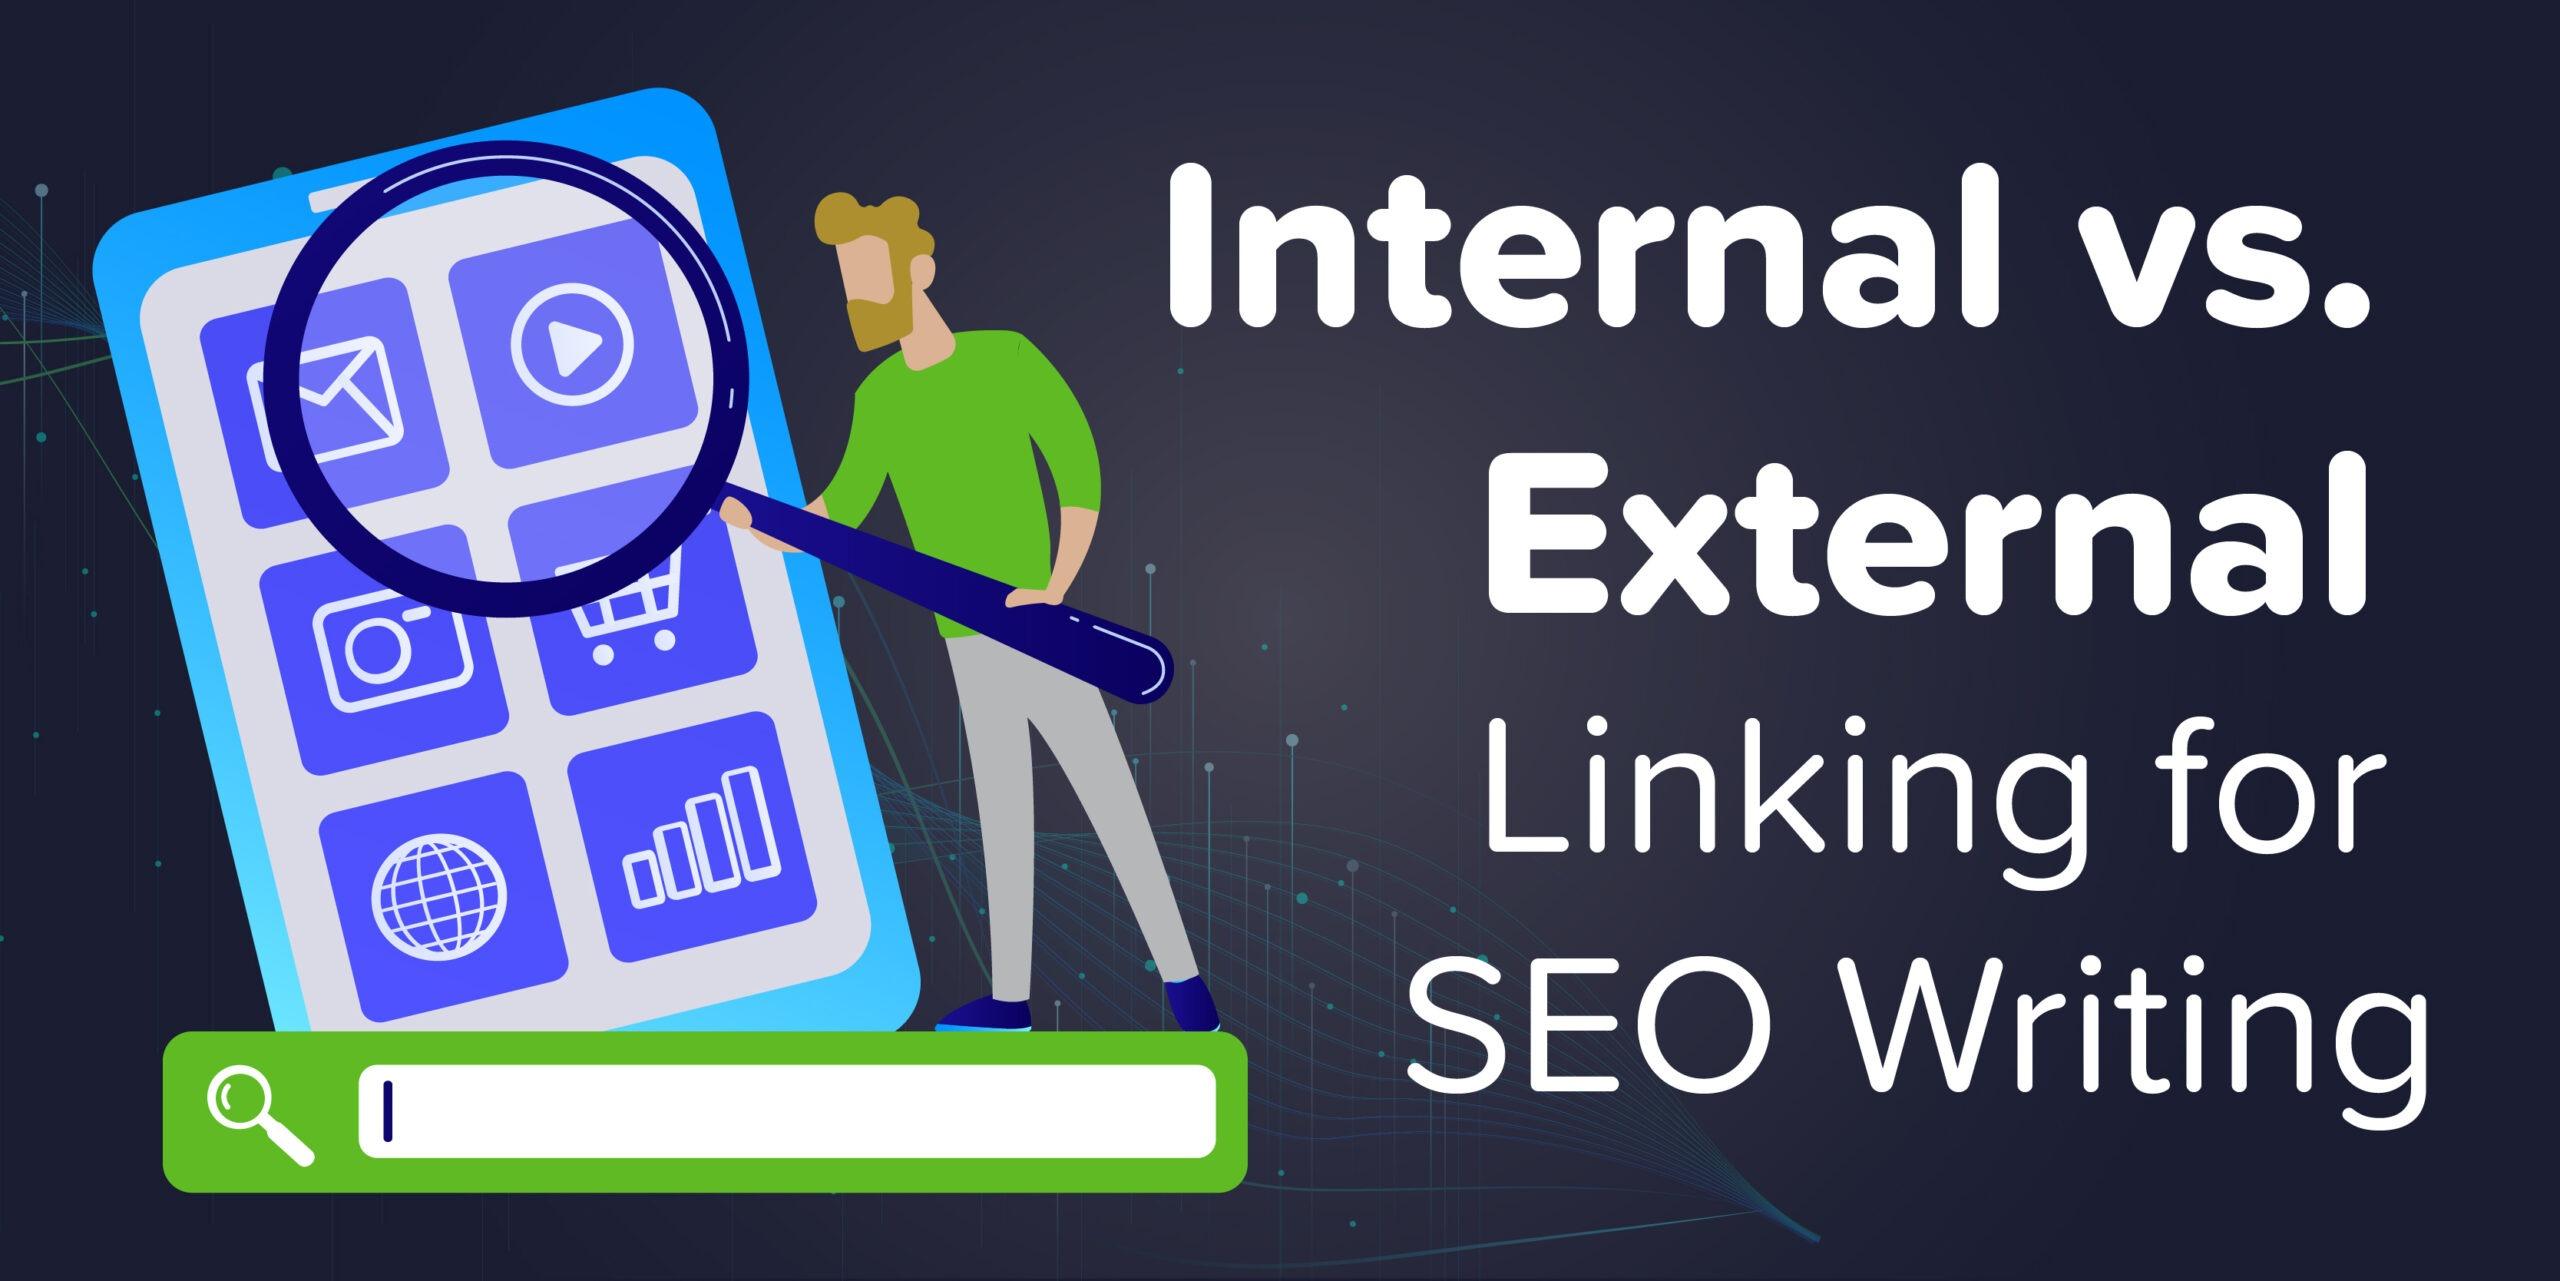 Internal vs External Linking for SEO Writing